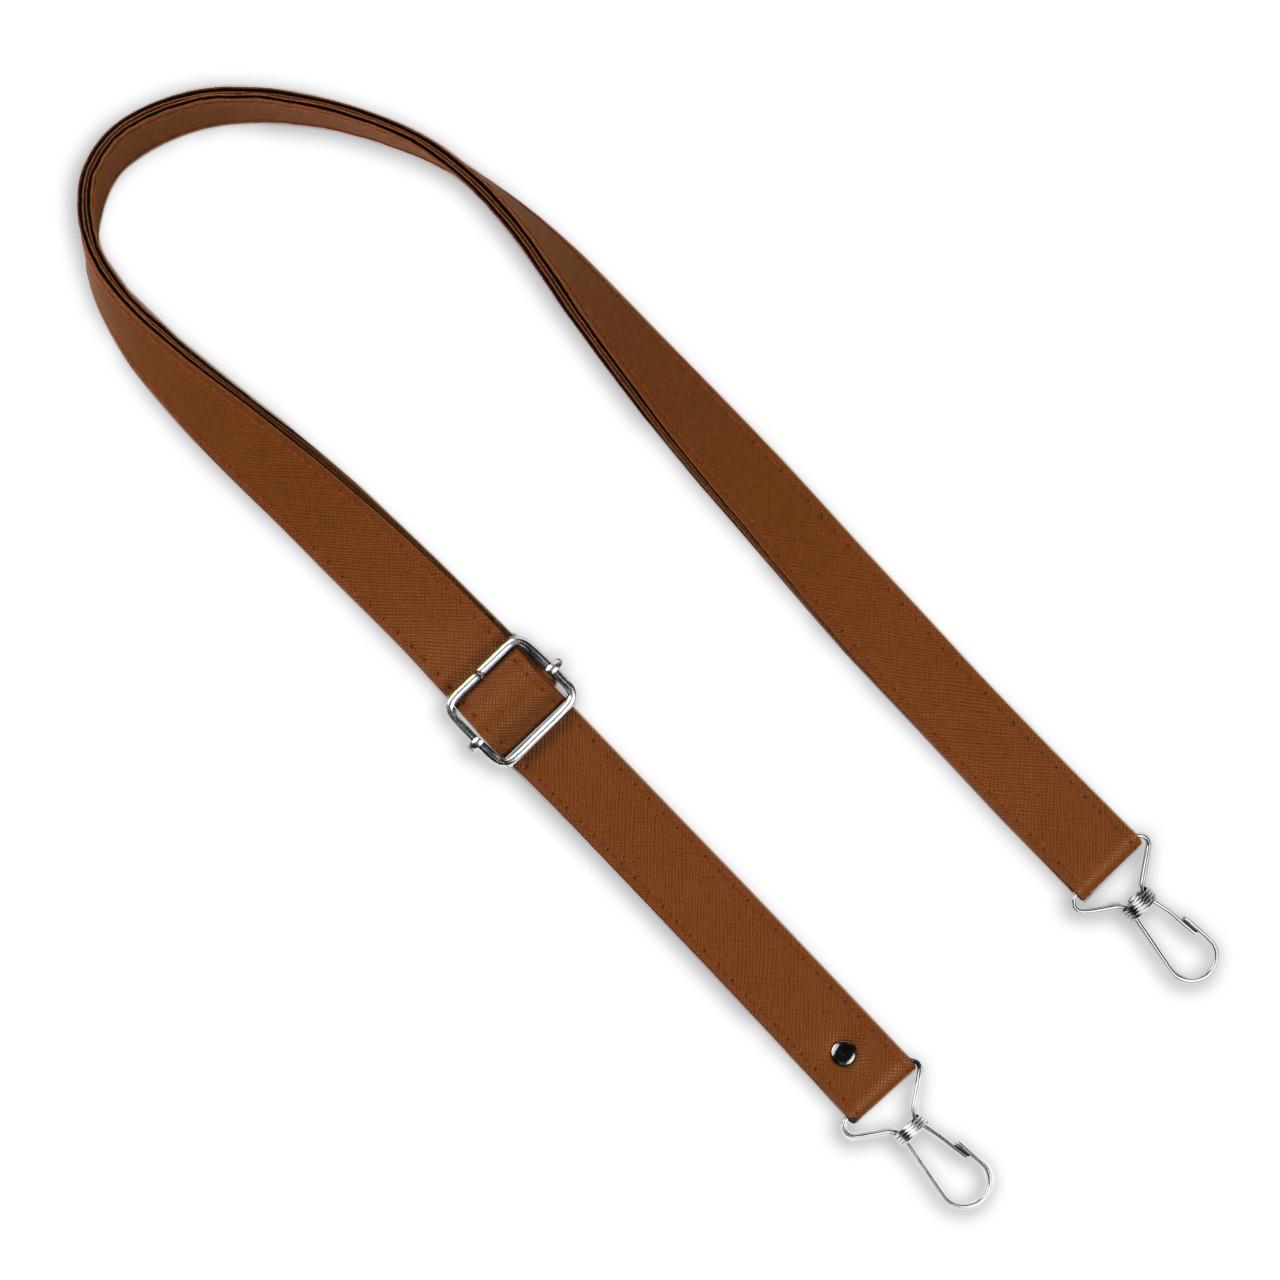 Ручка для сумки екокожа Браун регульована 66-130 см на неповоротних карабінах